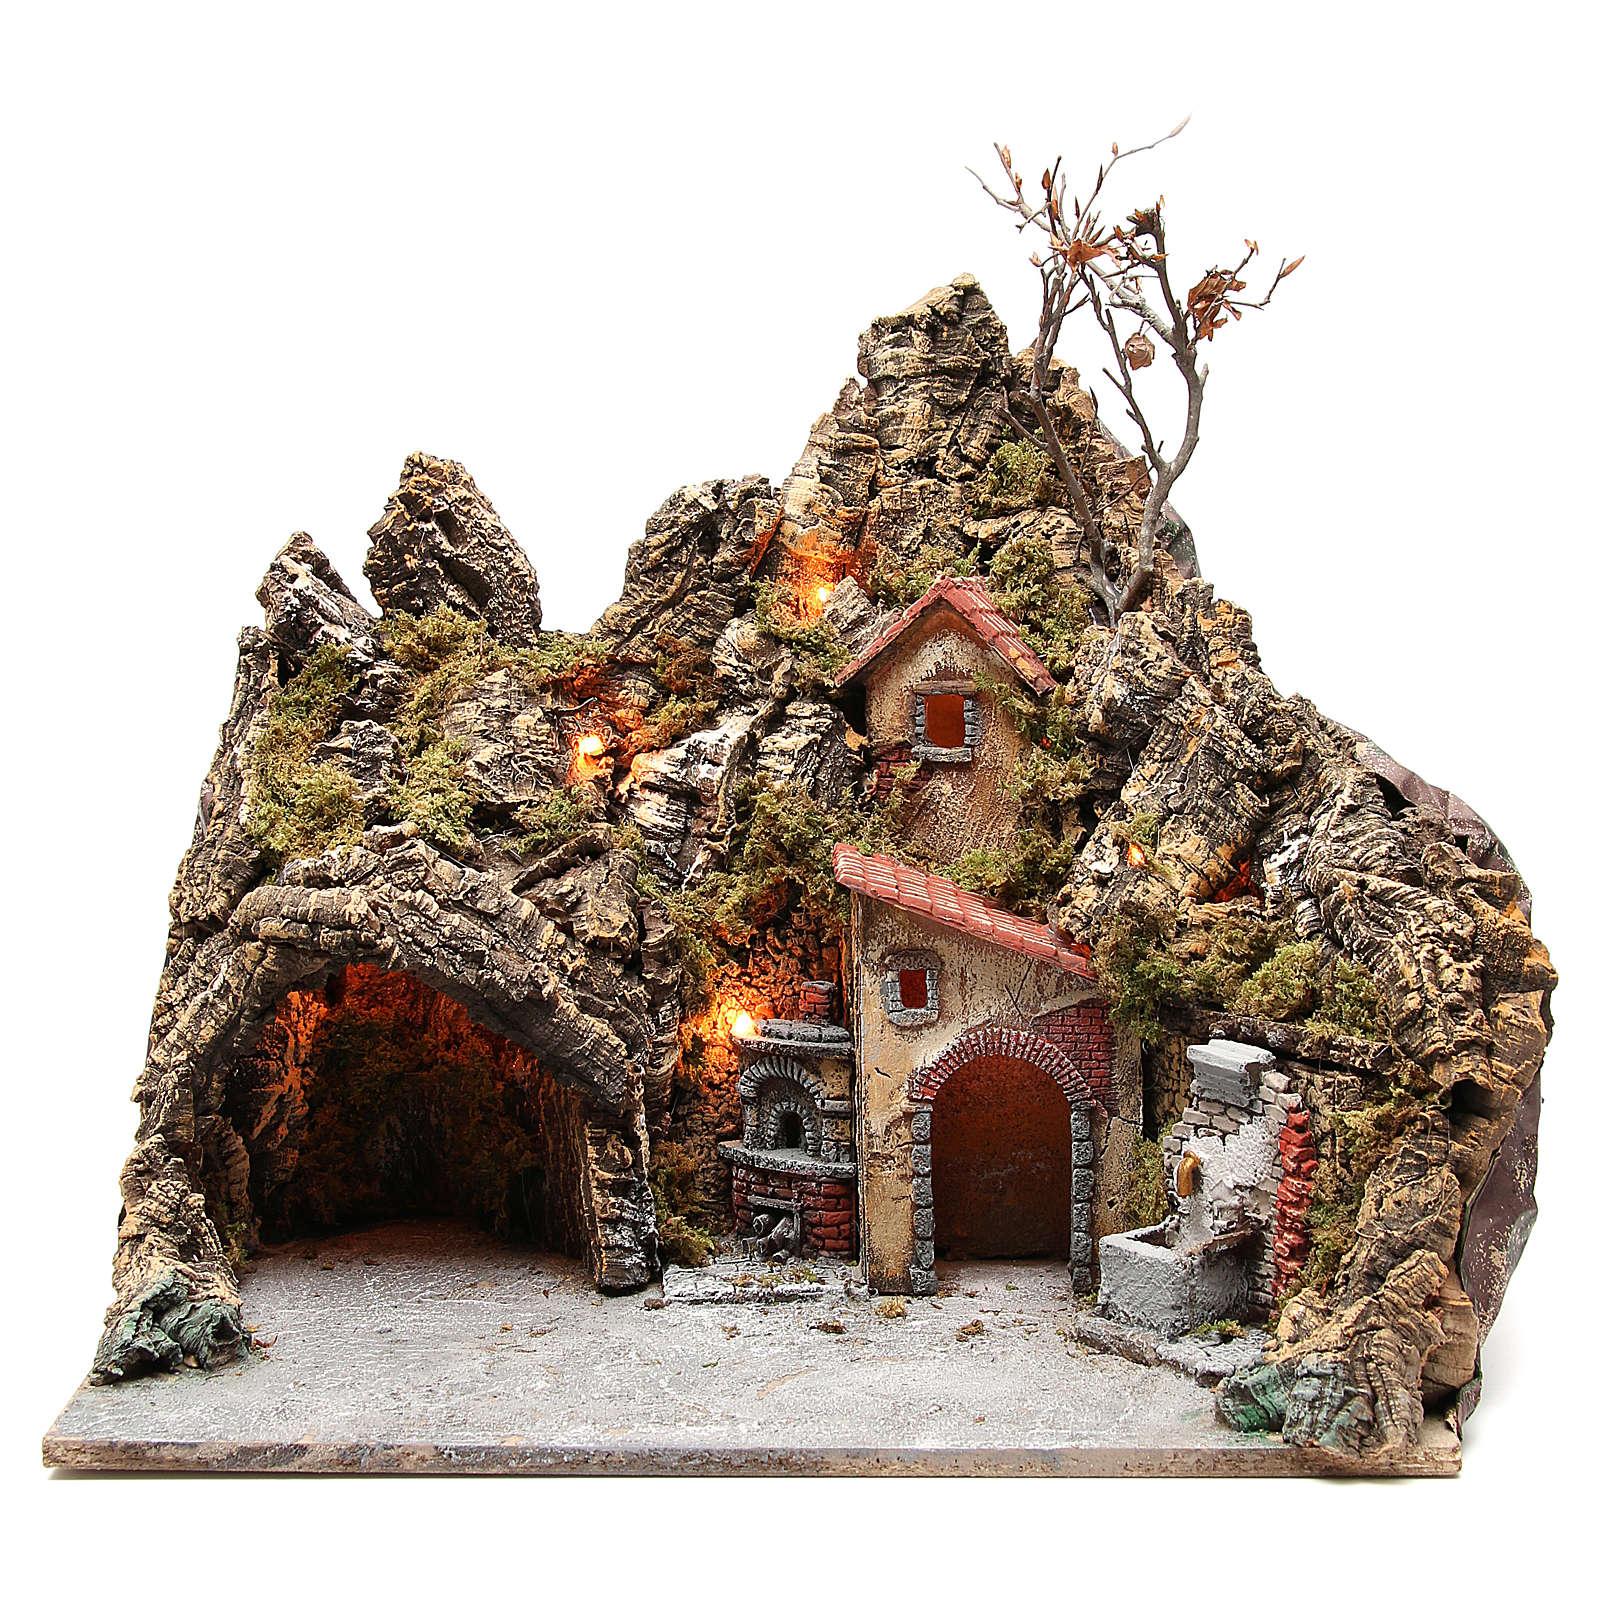 Illuminated village with fountain, oven and grotto, Neapolitan nativity 30x50x40cm 4